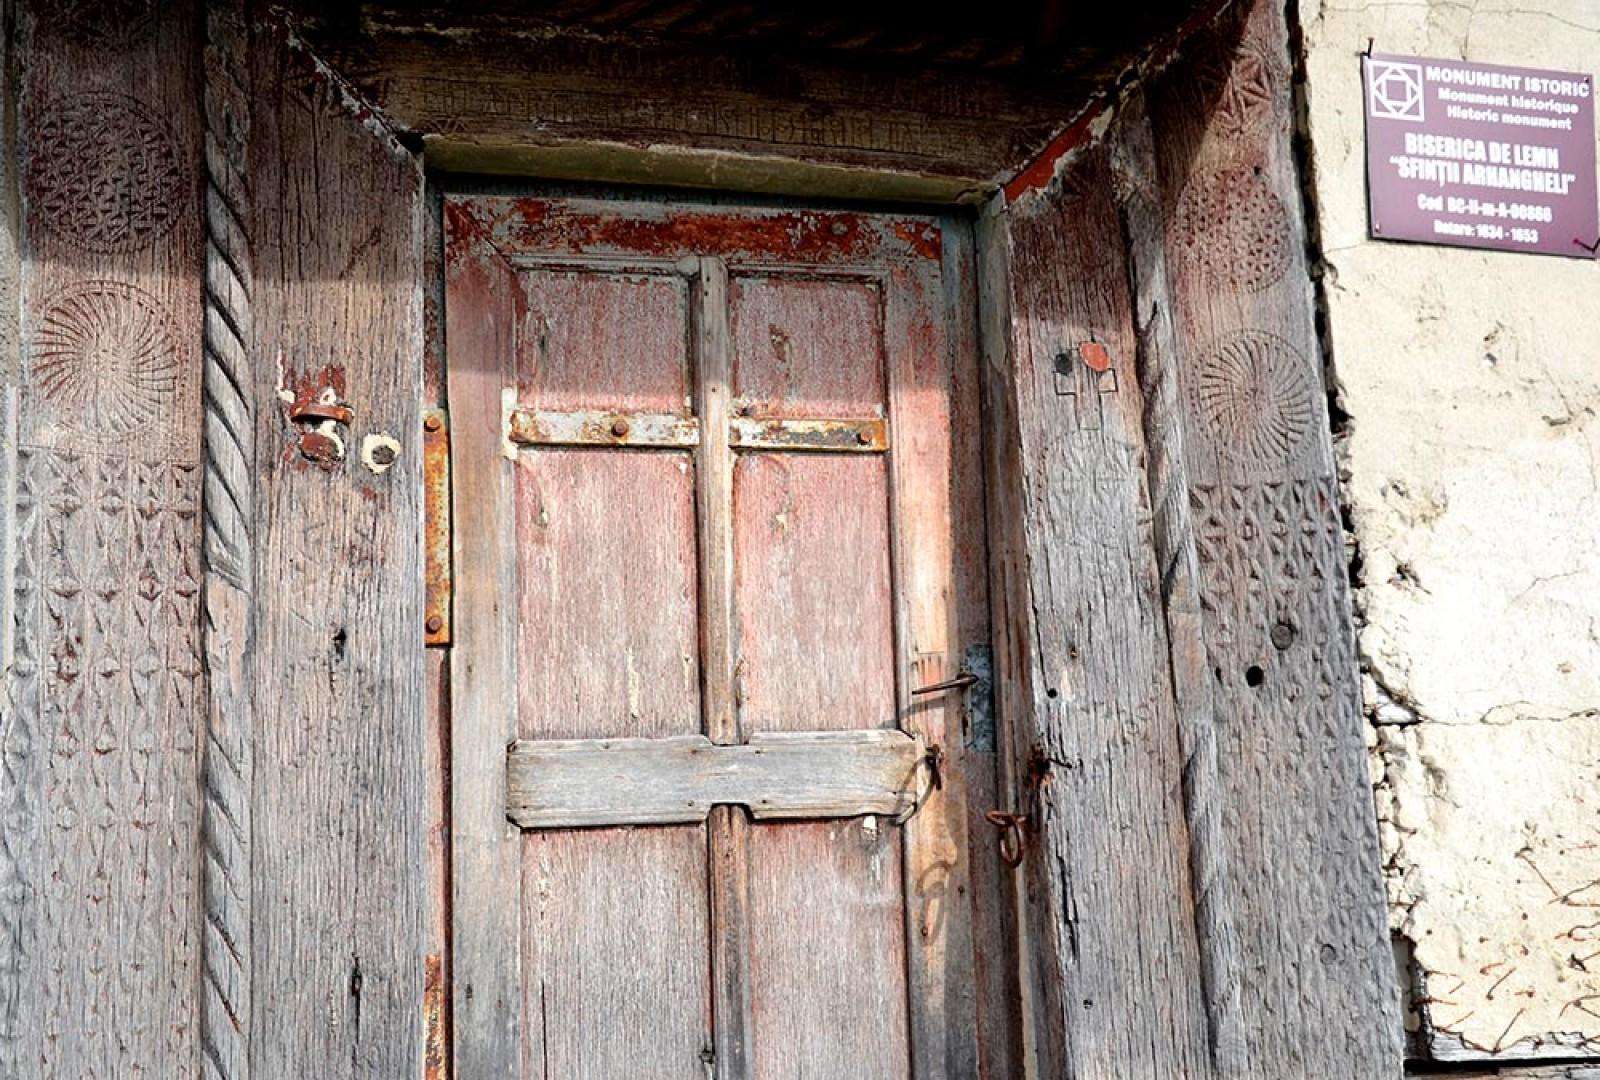 oprisesti-portal-intrare